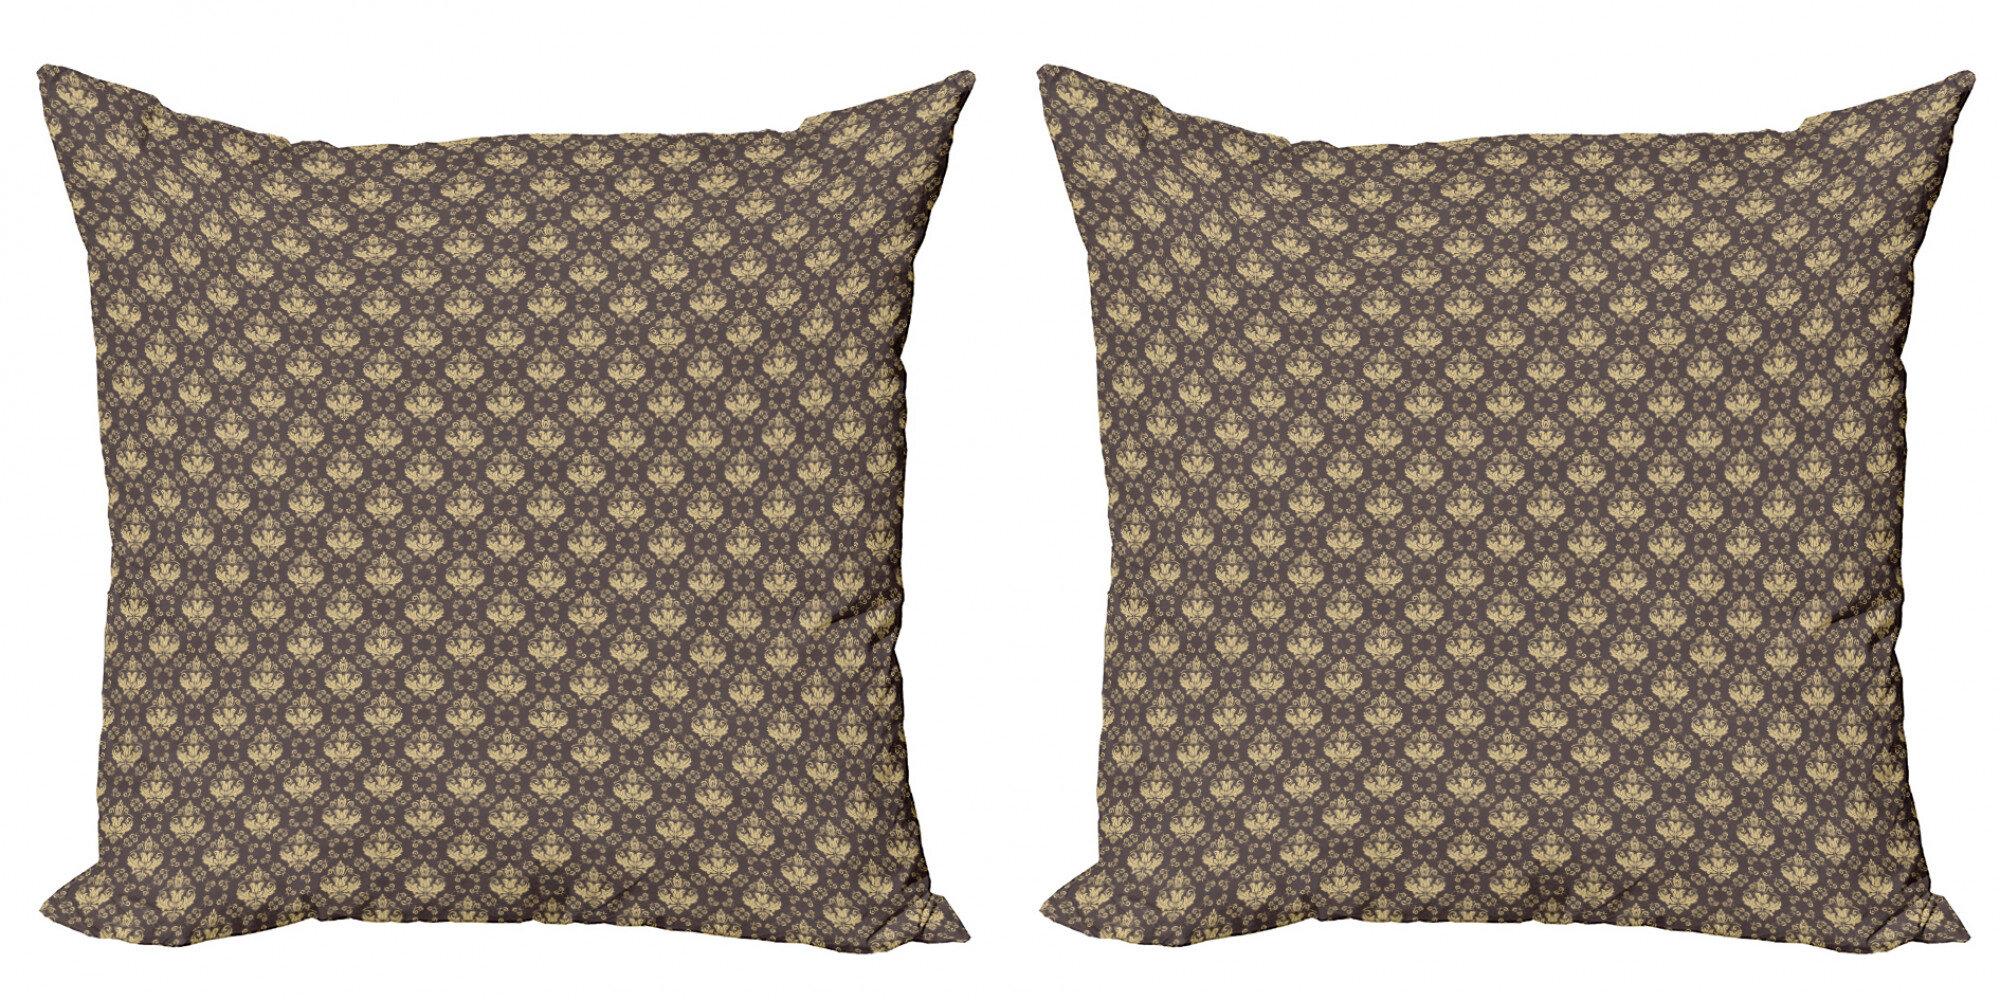 artdeco pillow decorative sofa pillow case home gift animal pattern pillow case Camel Pillow cushion cover